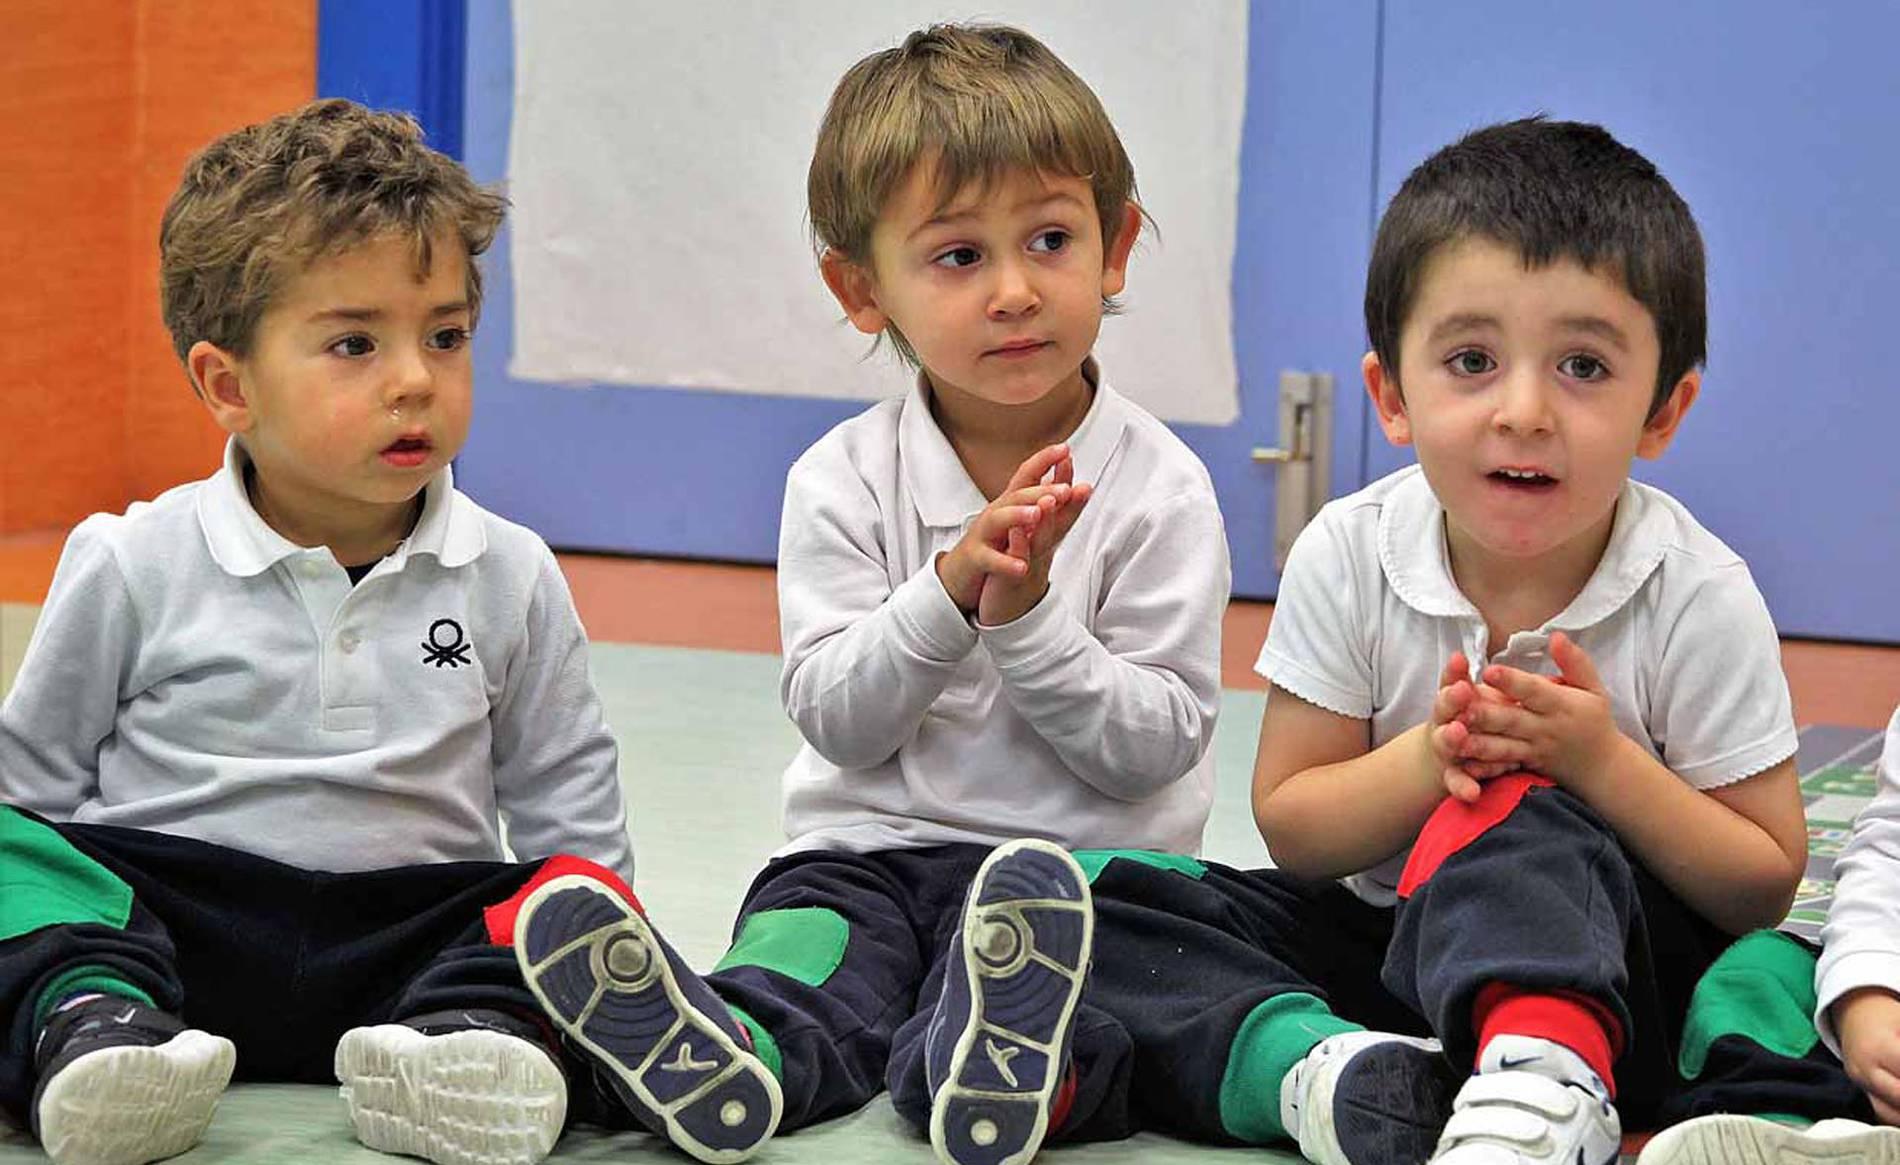 Claret Larraona (1/32) - Escolares de Claret Larraona - Navarra -